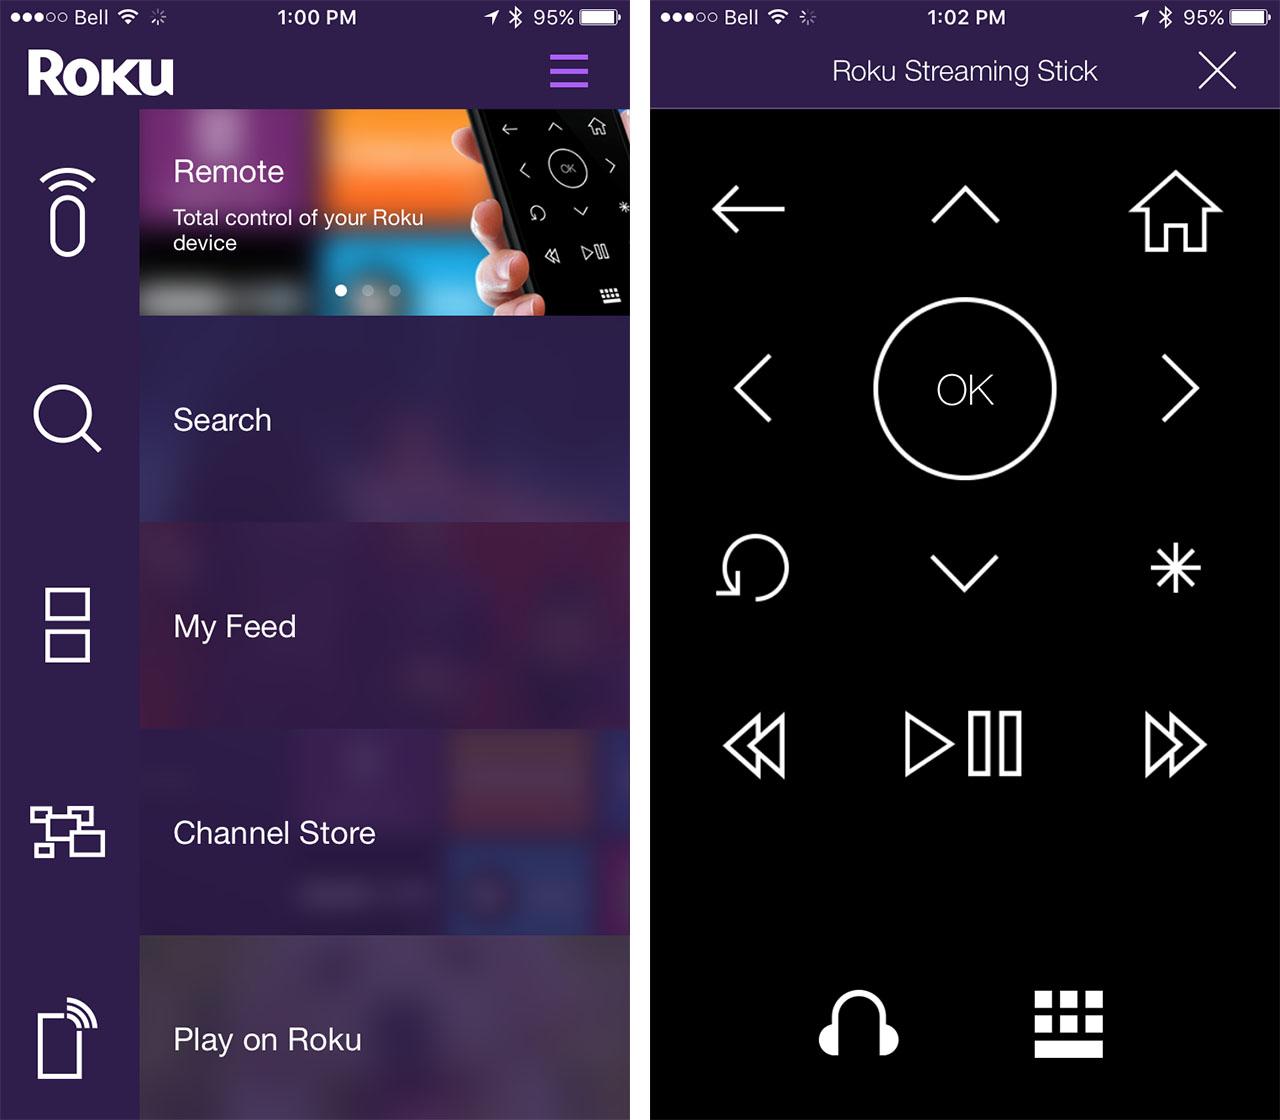 Roku Streaming Stick Vs. Google Chromecast: What Stick Is